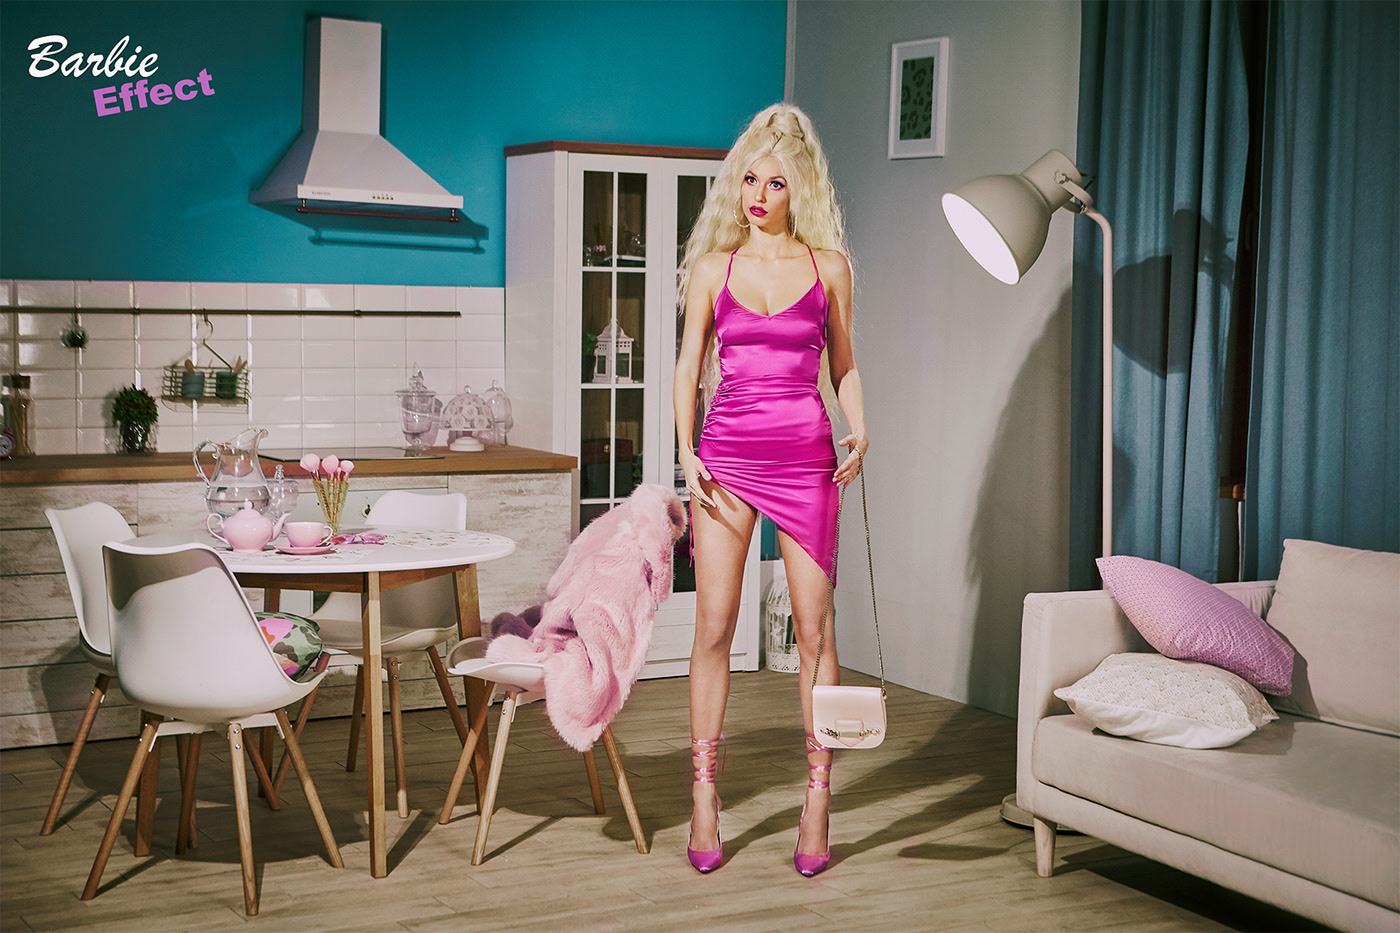 Barbie Effect